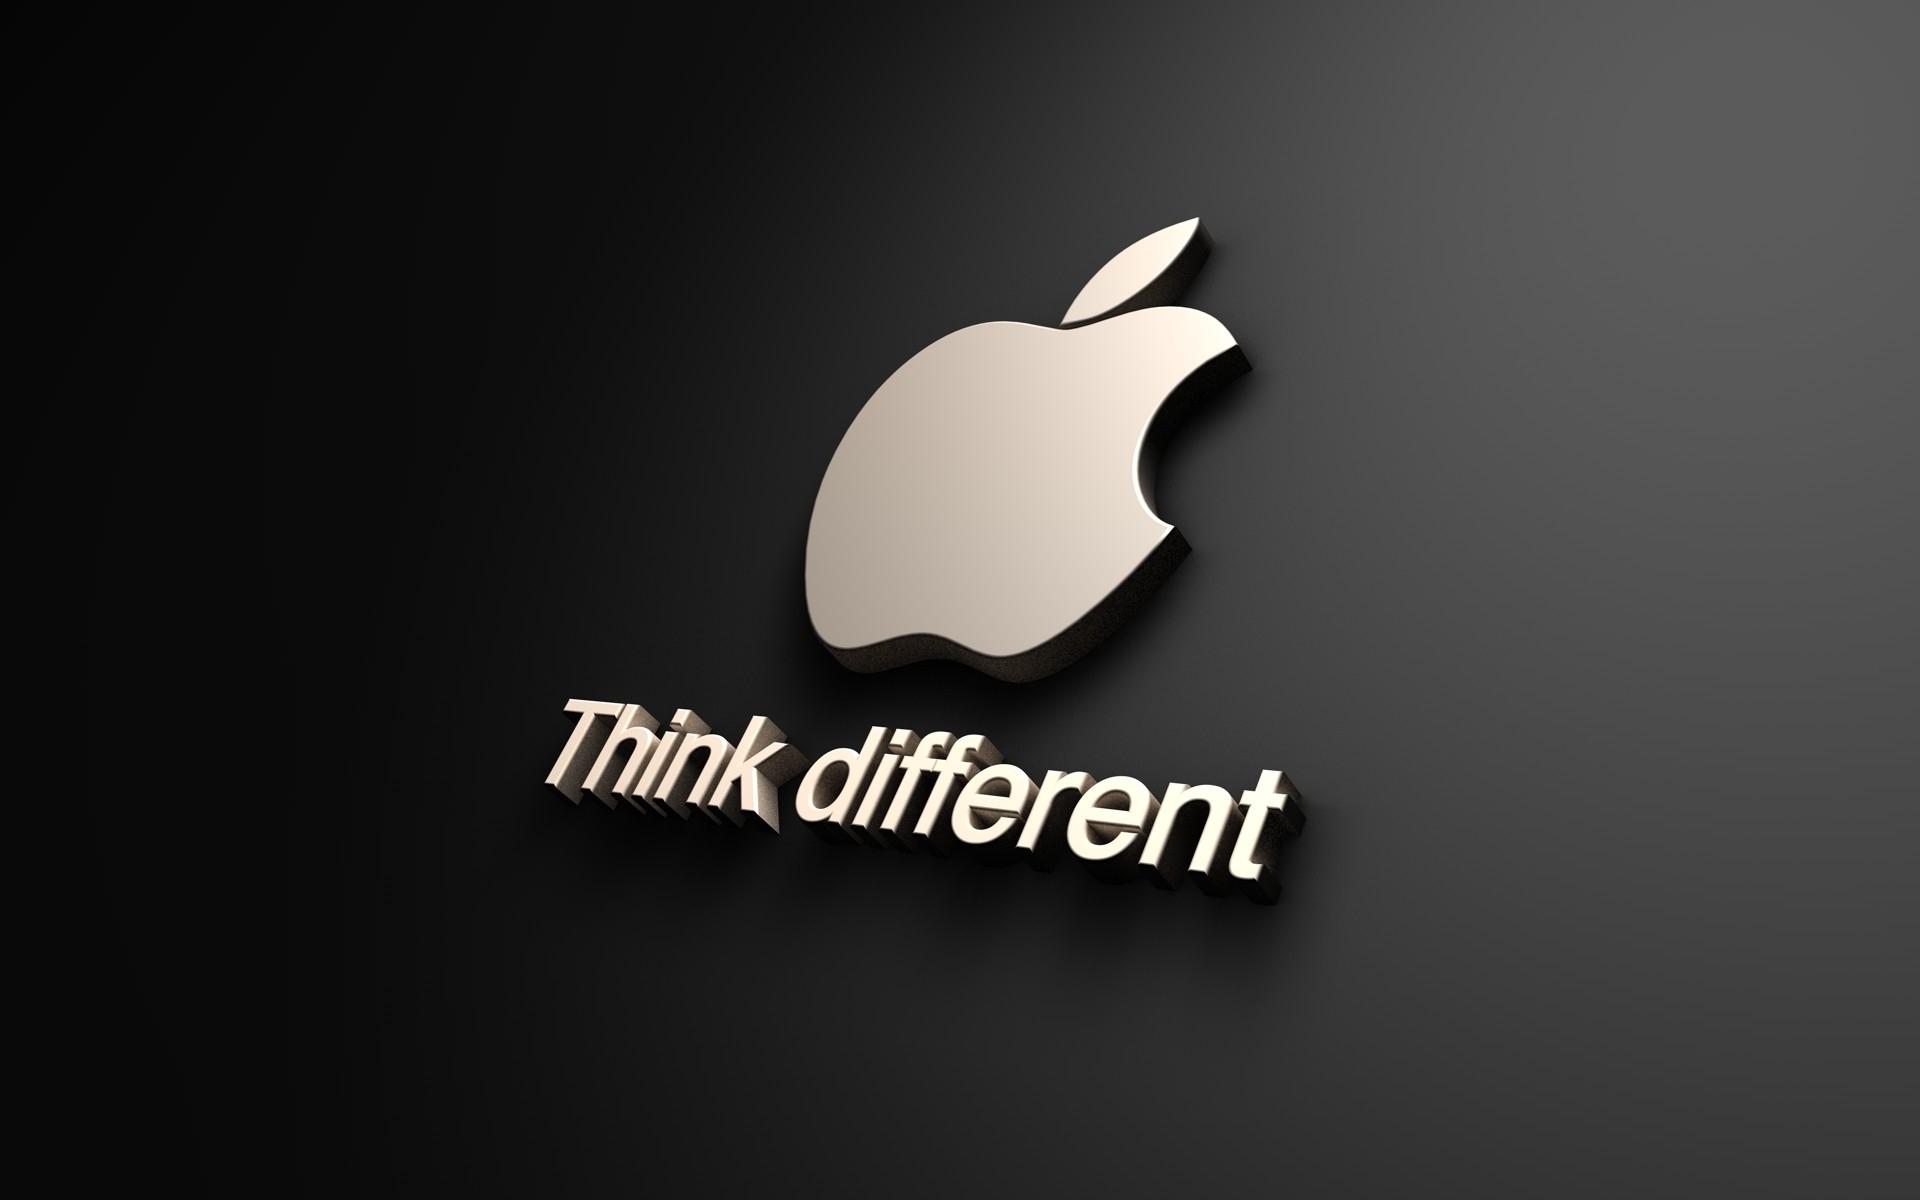 apple-icon-apple